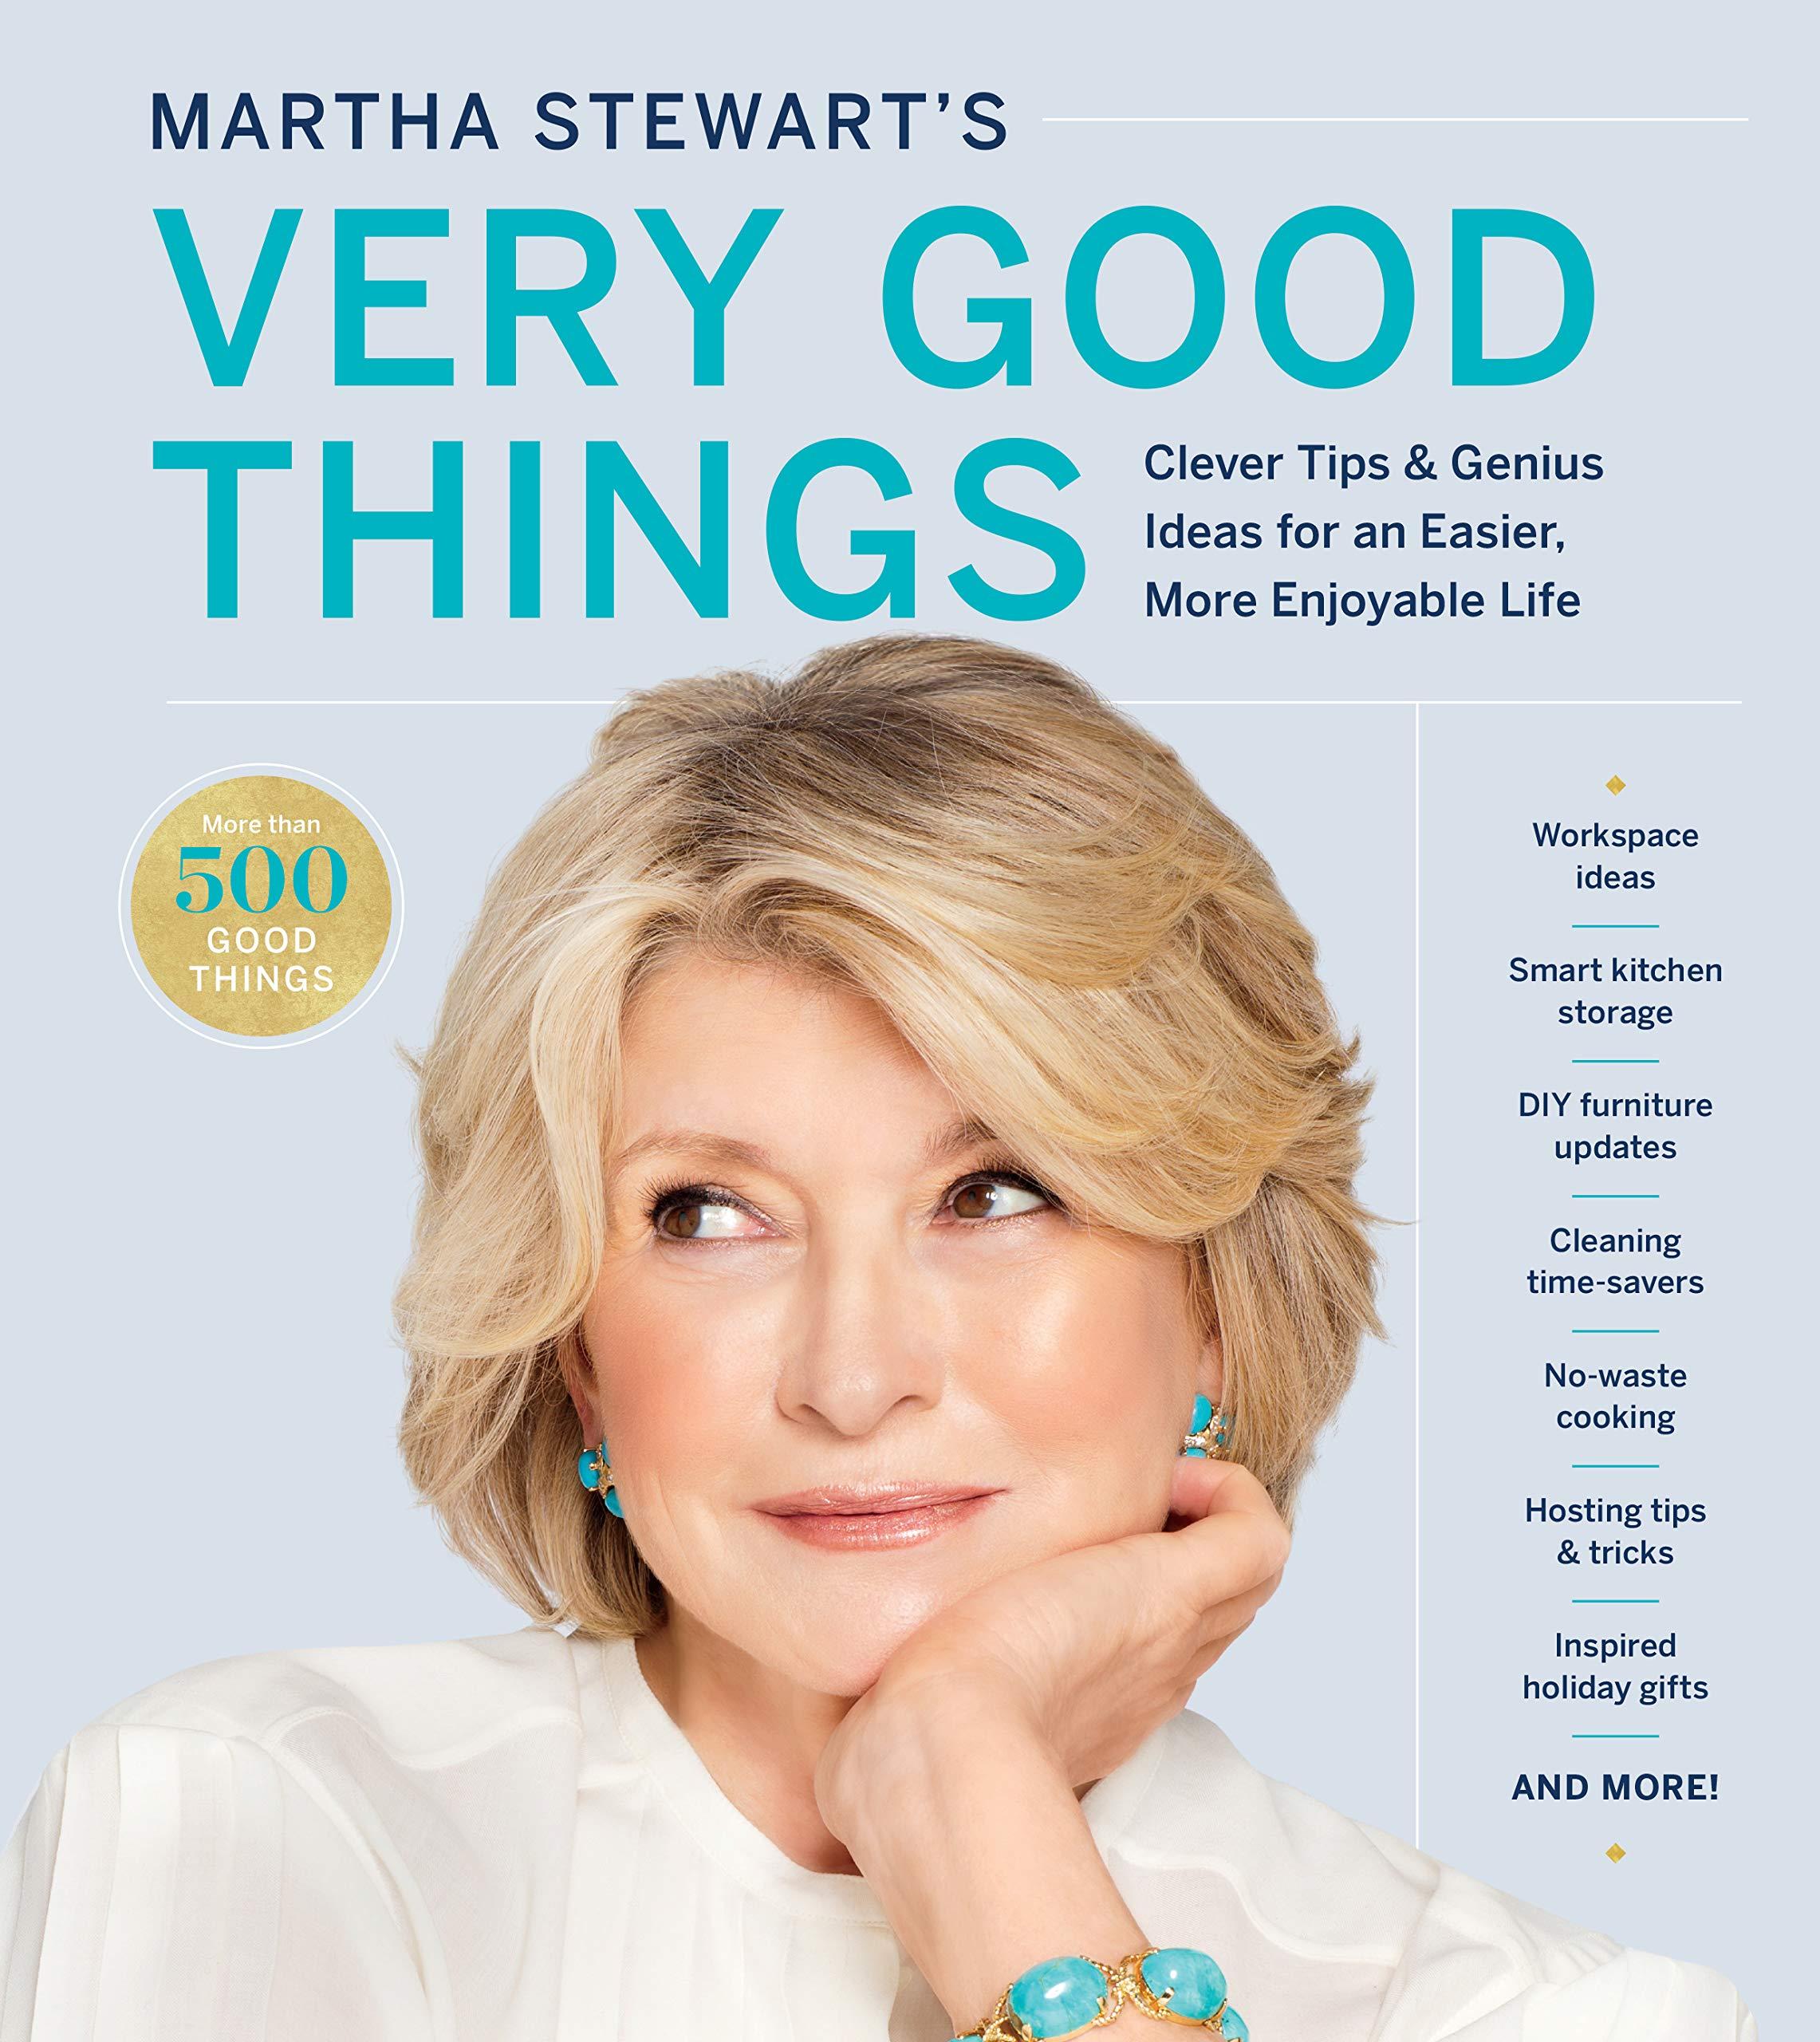 Martha Stewart S Very Good Things Clever Tips Genius Ideas For An Easier More Enjoyable Life Stewart Martha 9781328508263 Amazon Com Books